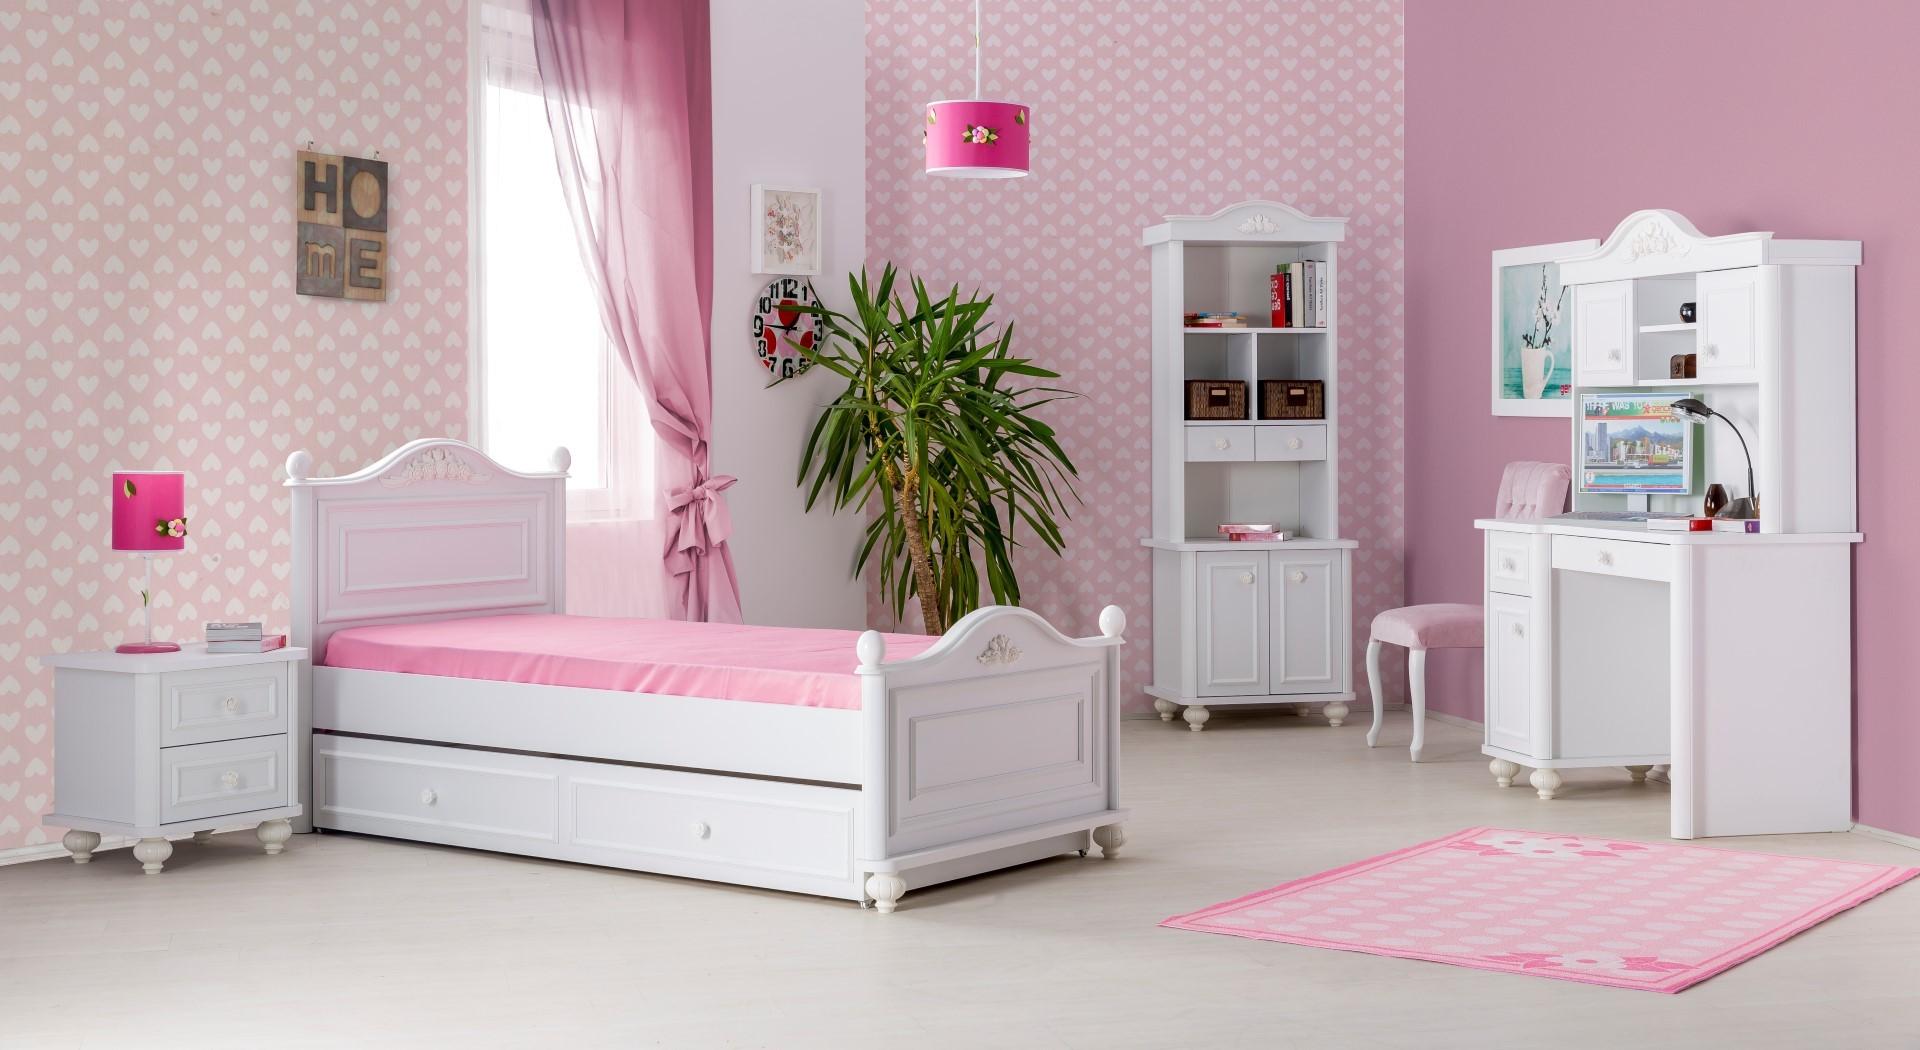 Bella boekenkast meisjes kamer Specialist in kinderkamers en slaapkamers